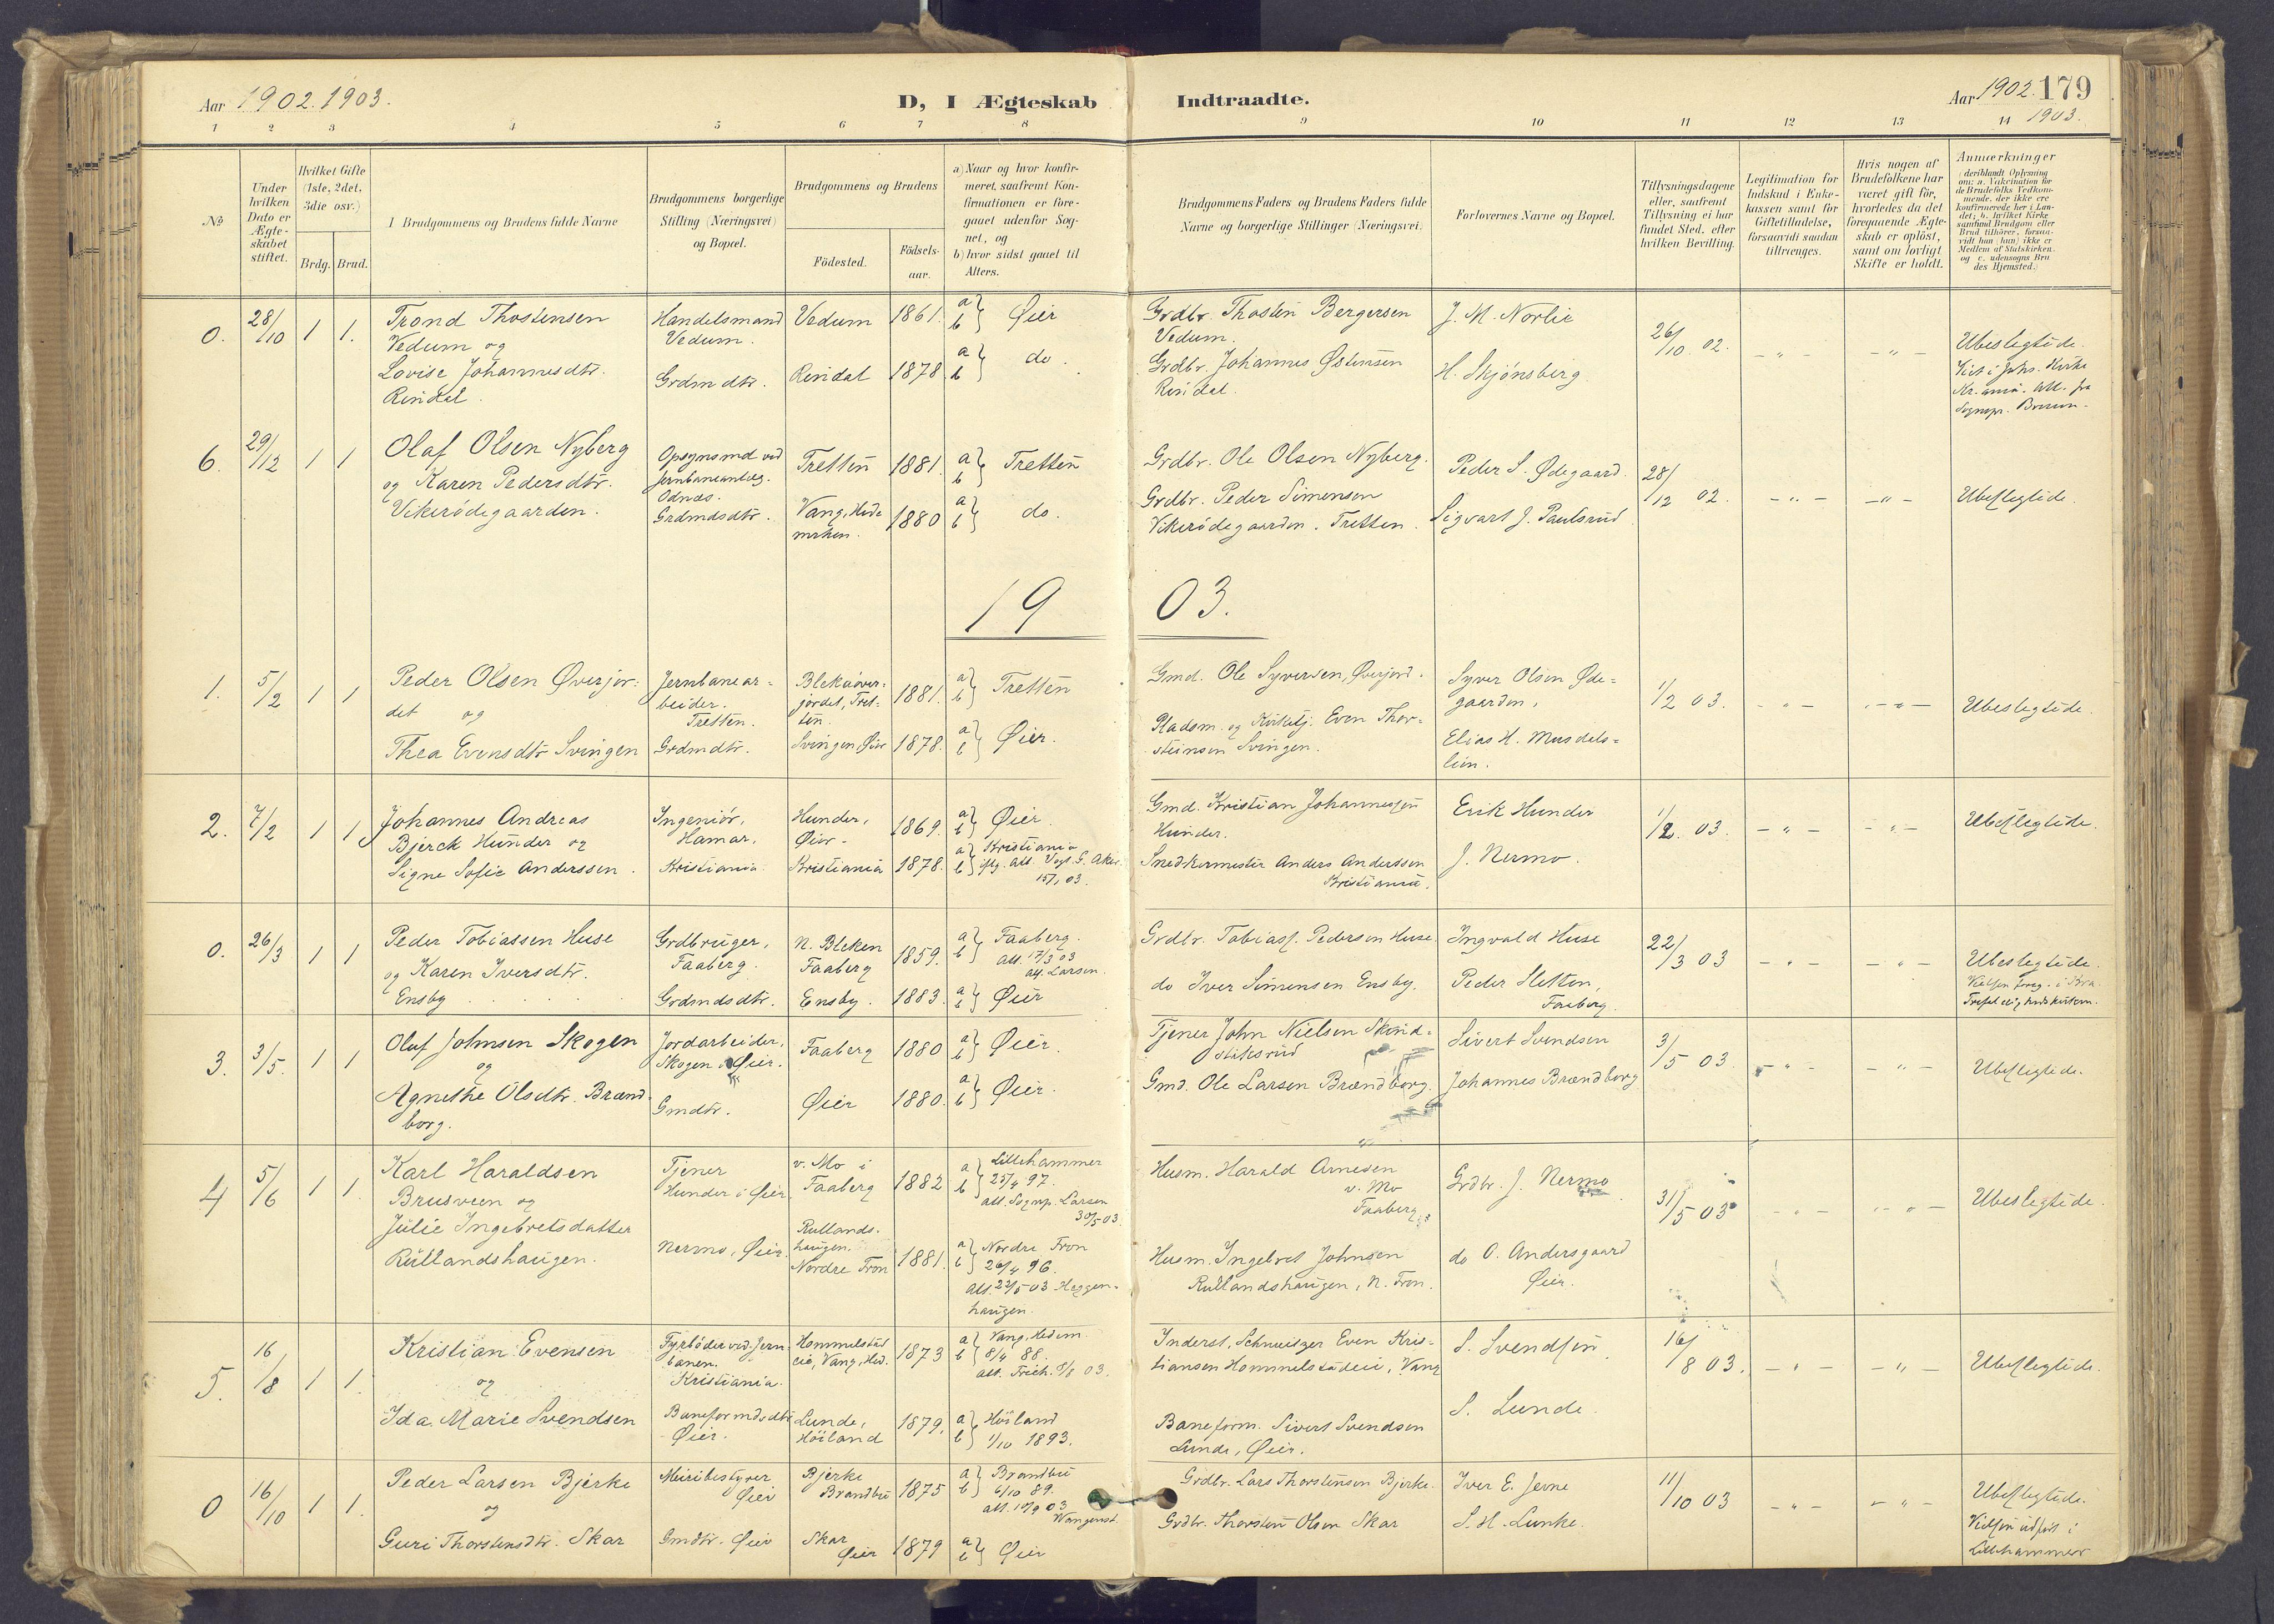 SAH, Øyer prestekontor, Ministerialbok nr. 12, 1897-1920, s. 179